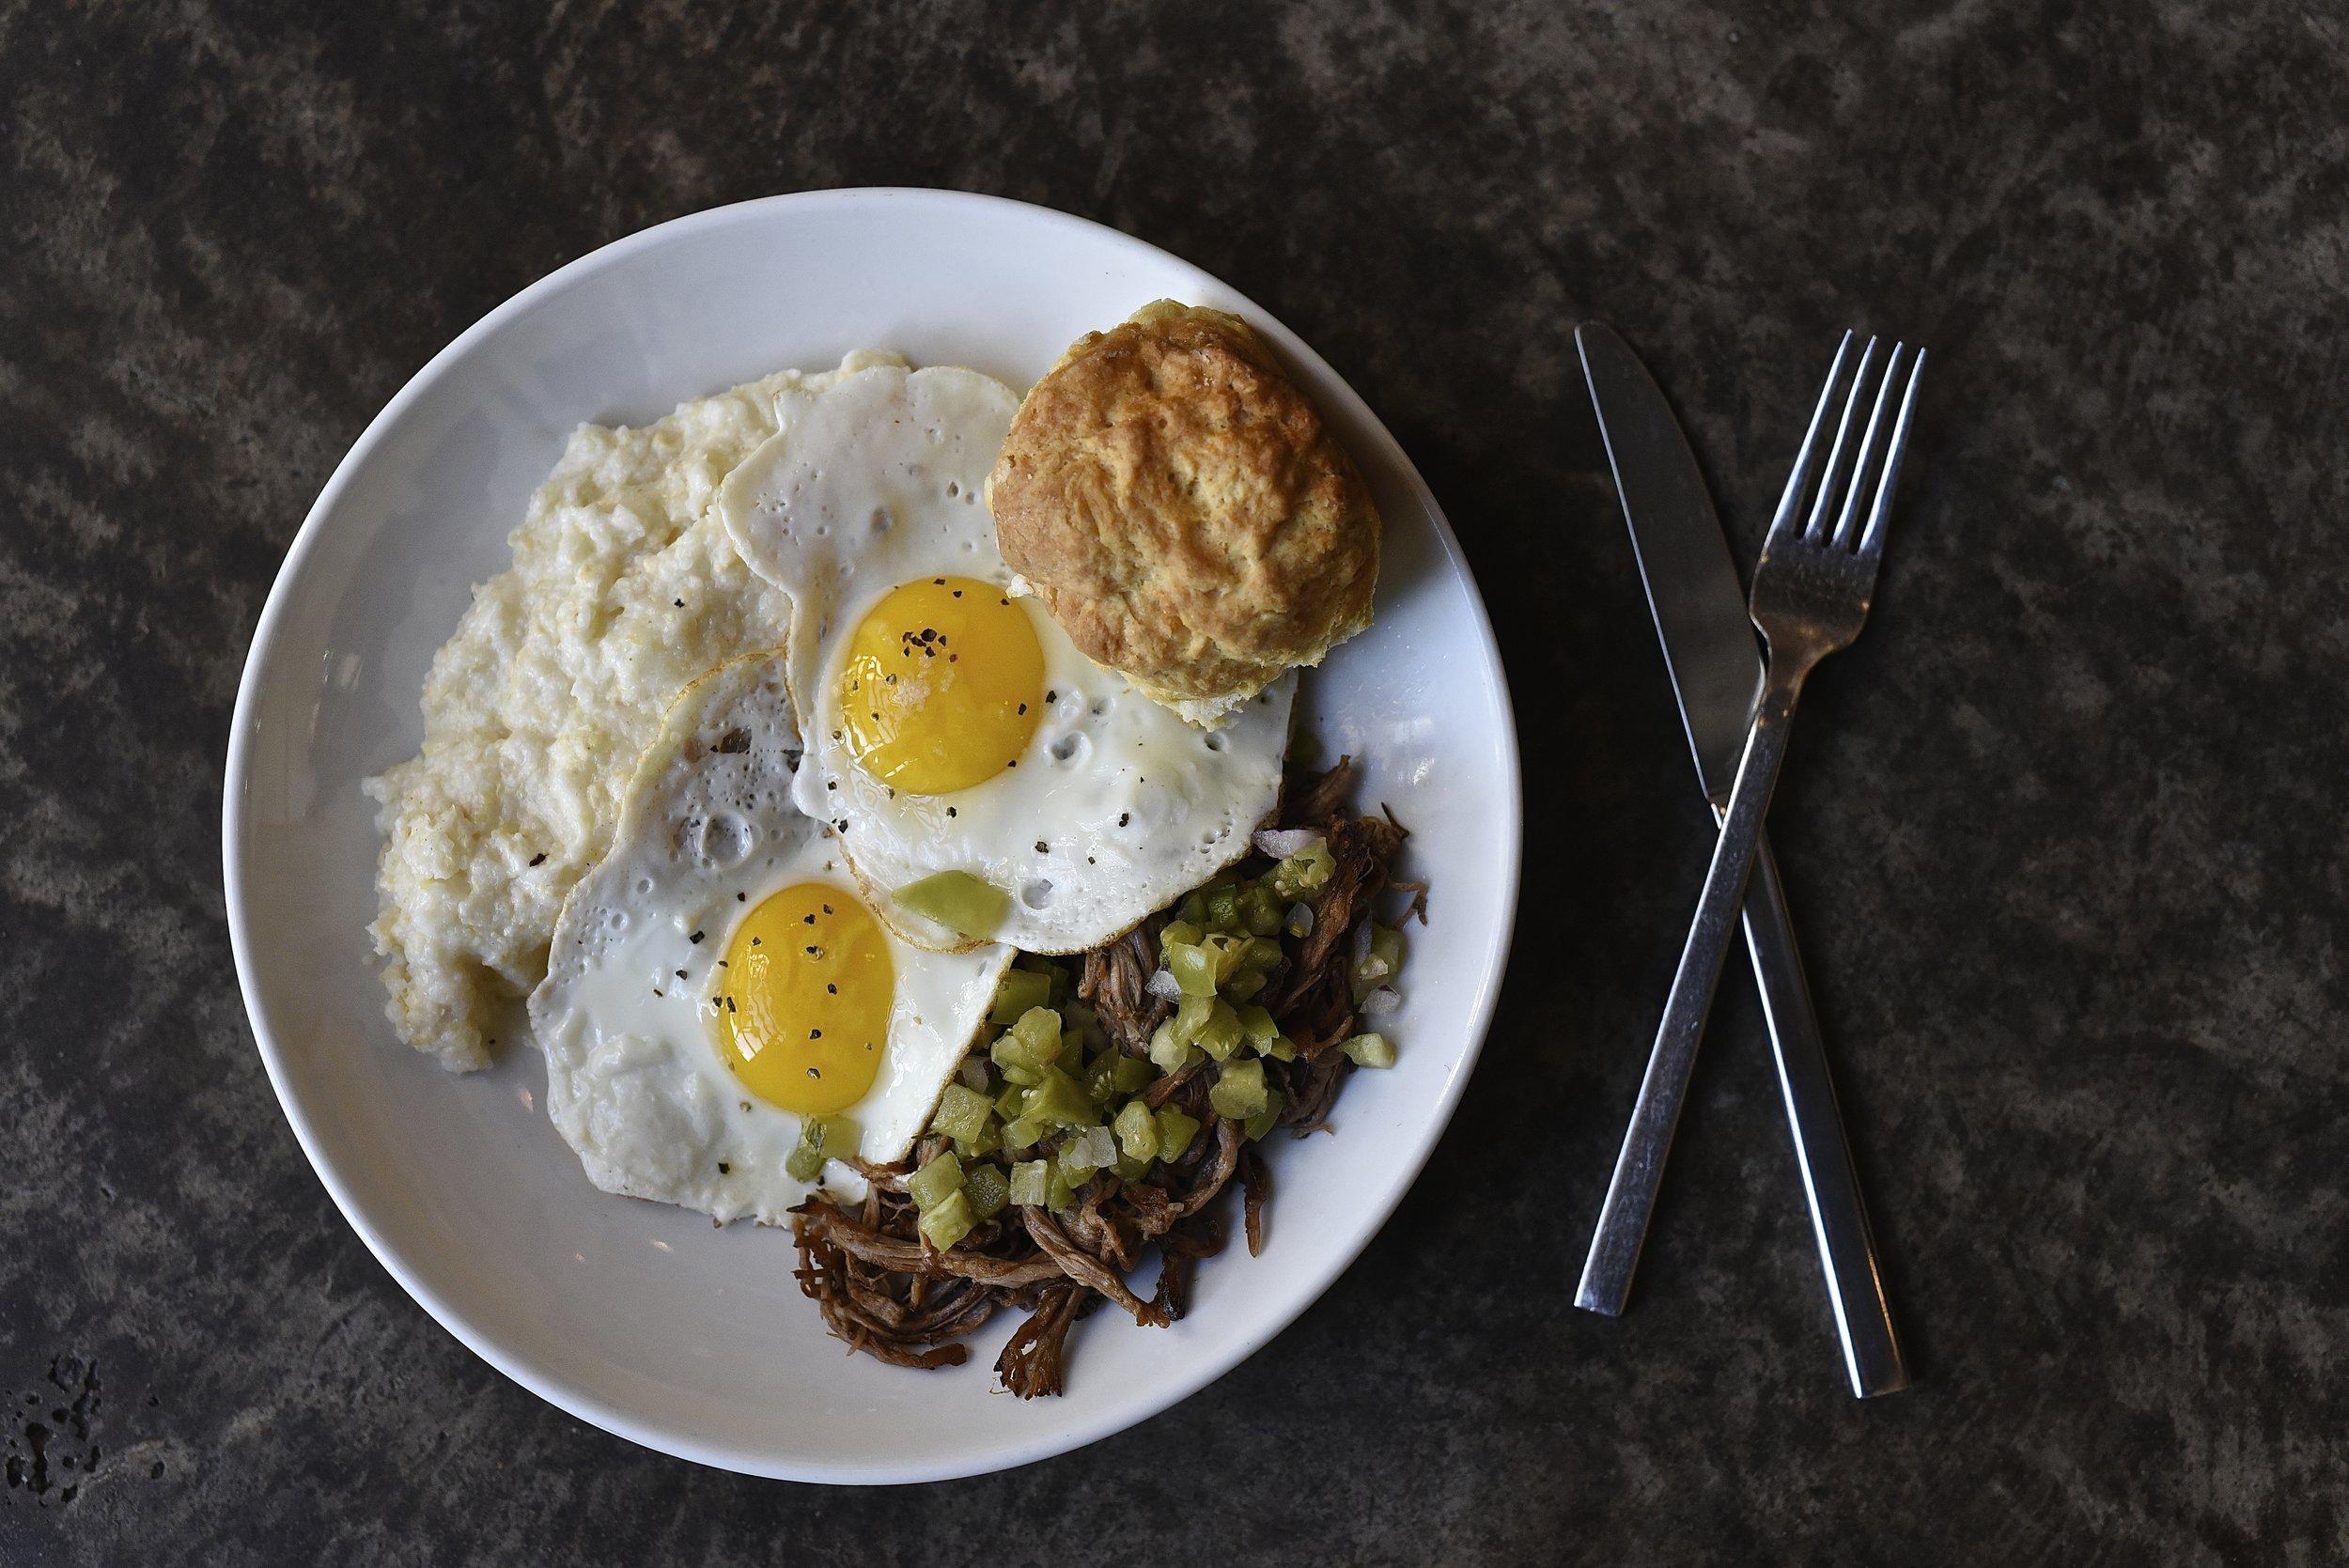 Dish-Brisket and Eggs, Kimberly Park.jpg